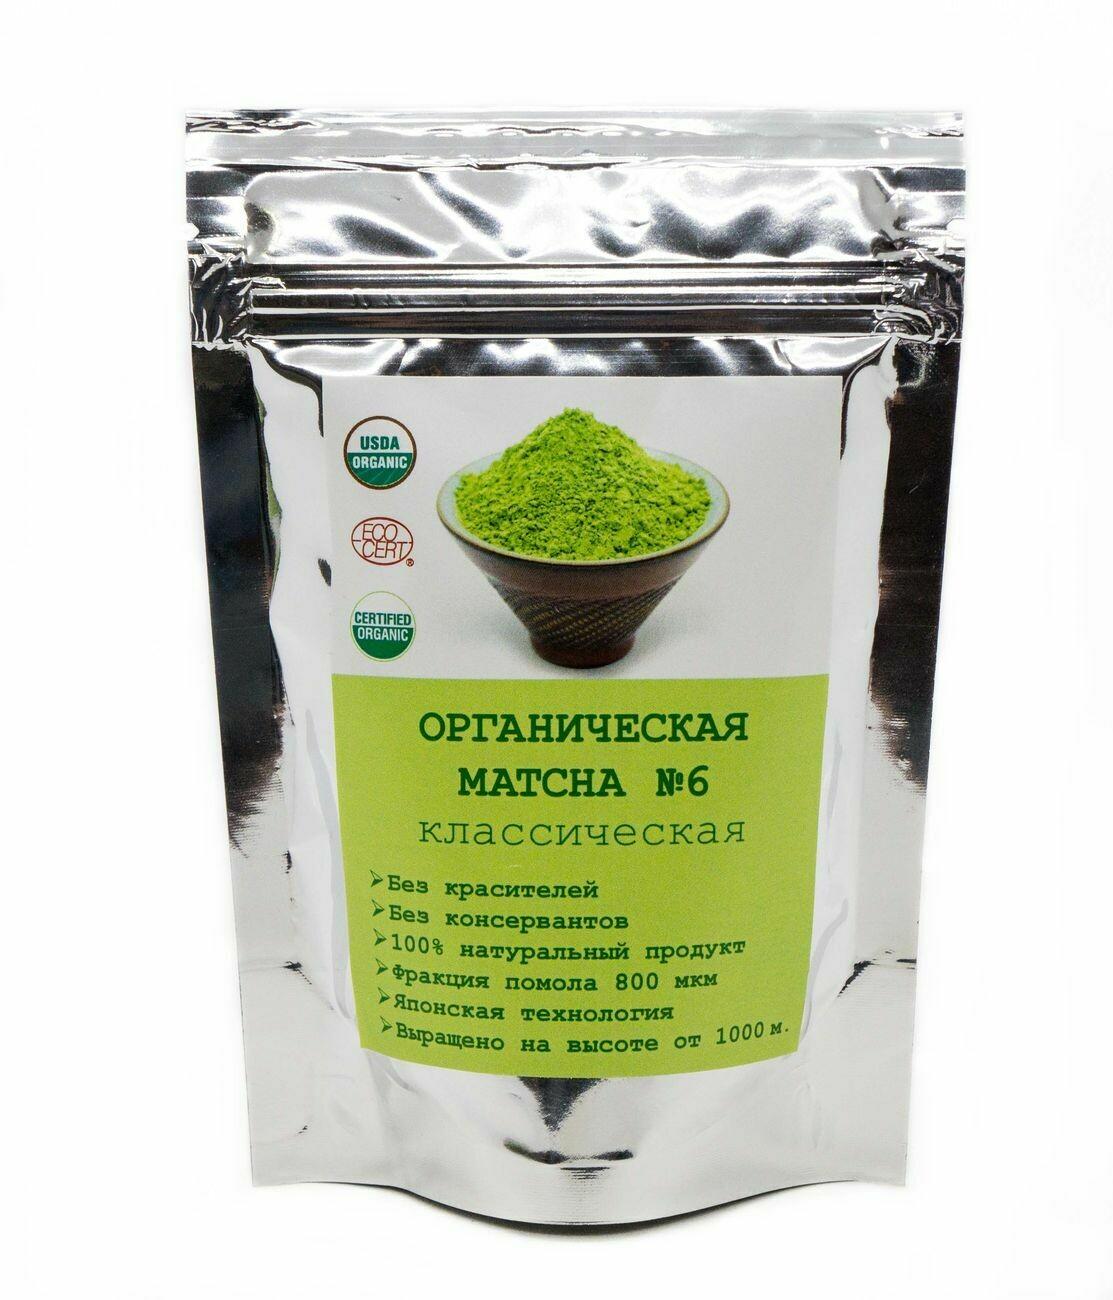 "2942.6.1 Чай зеленый  ""Матча"" №6 50гр."